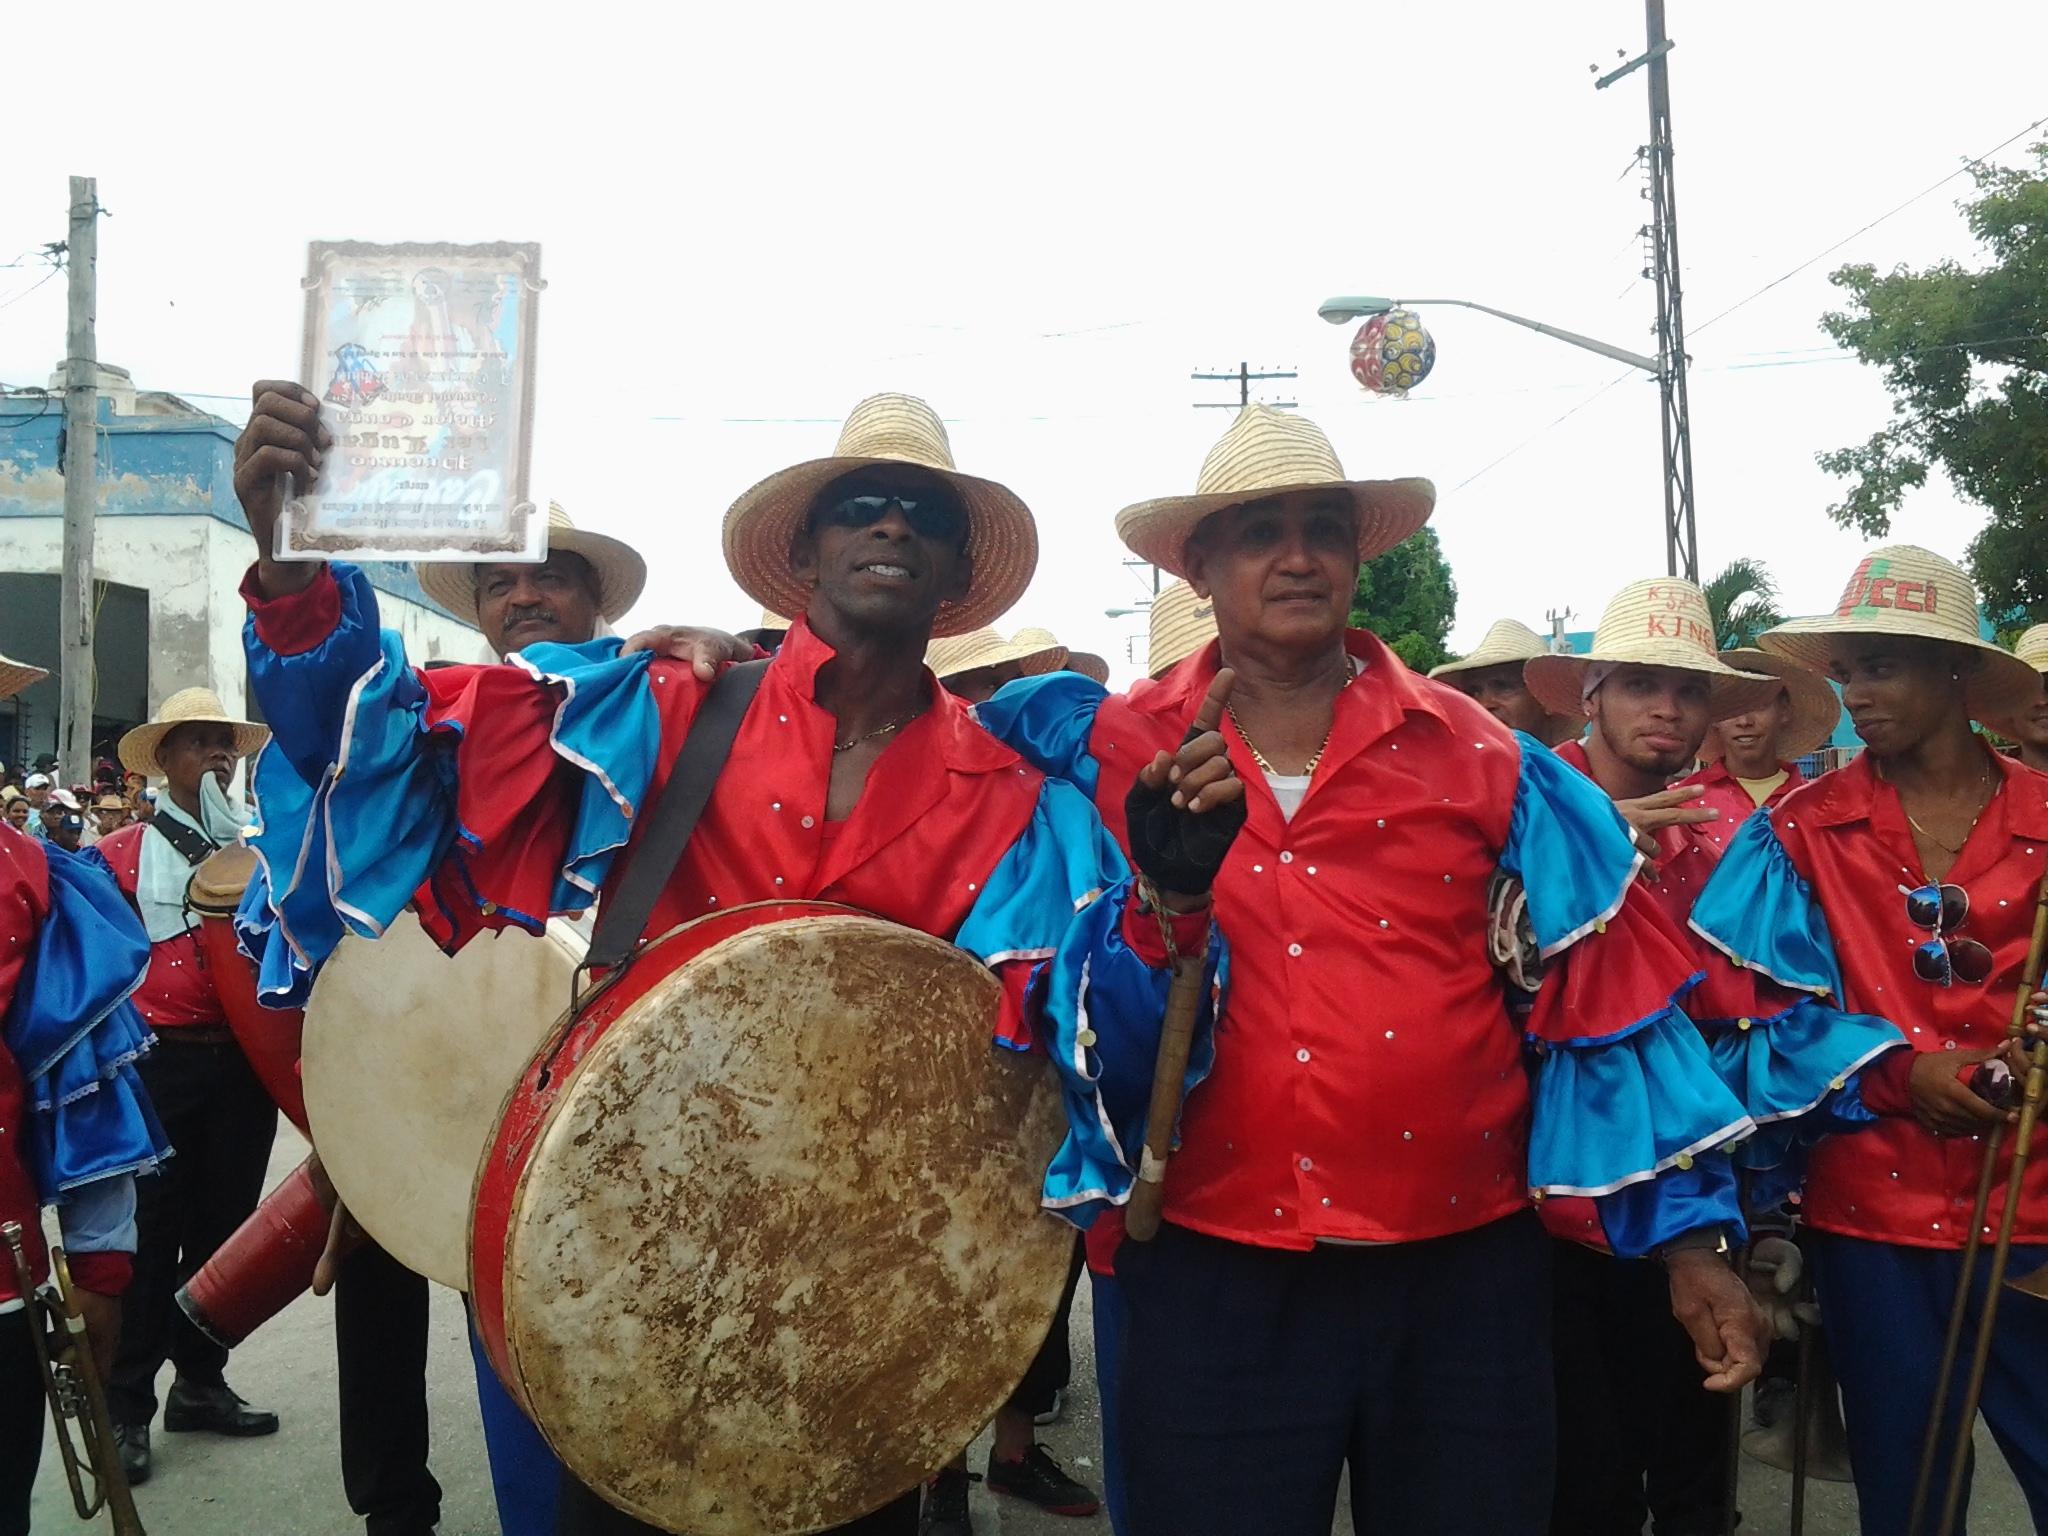 Gana comparsa La Pesquera Carnaval Manzanillo 2018 (+ fotos)